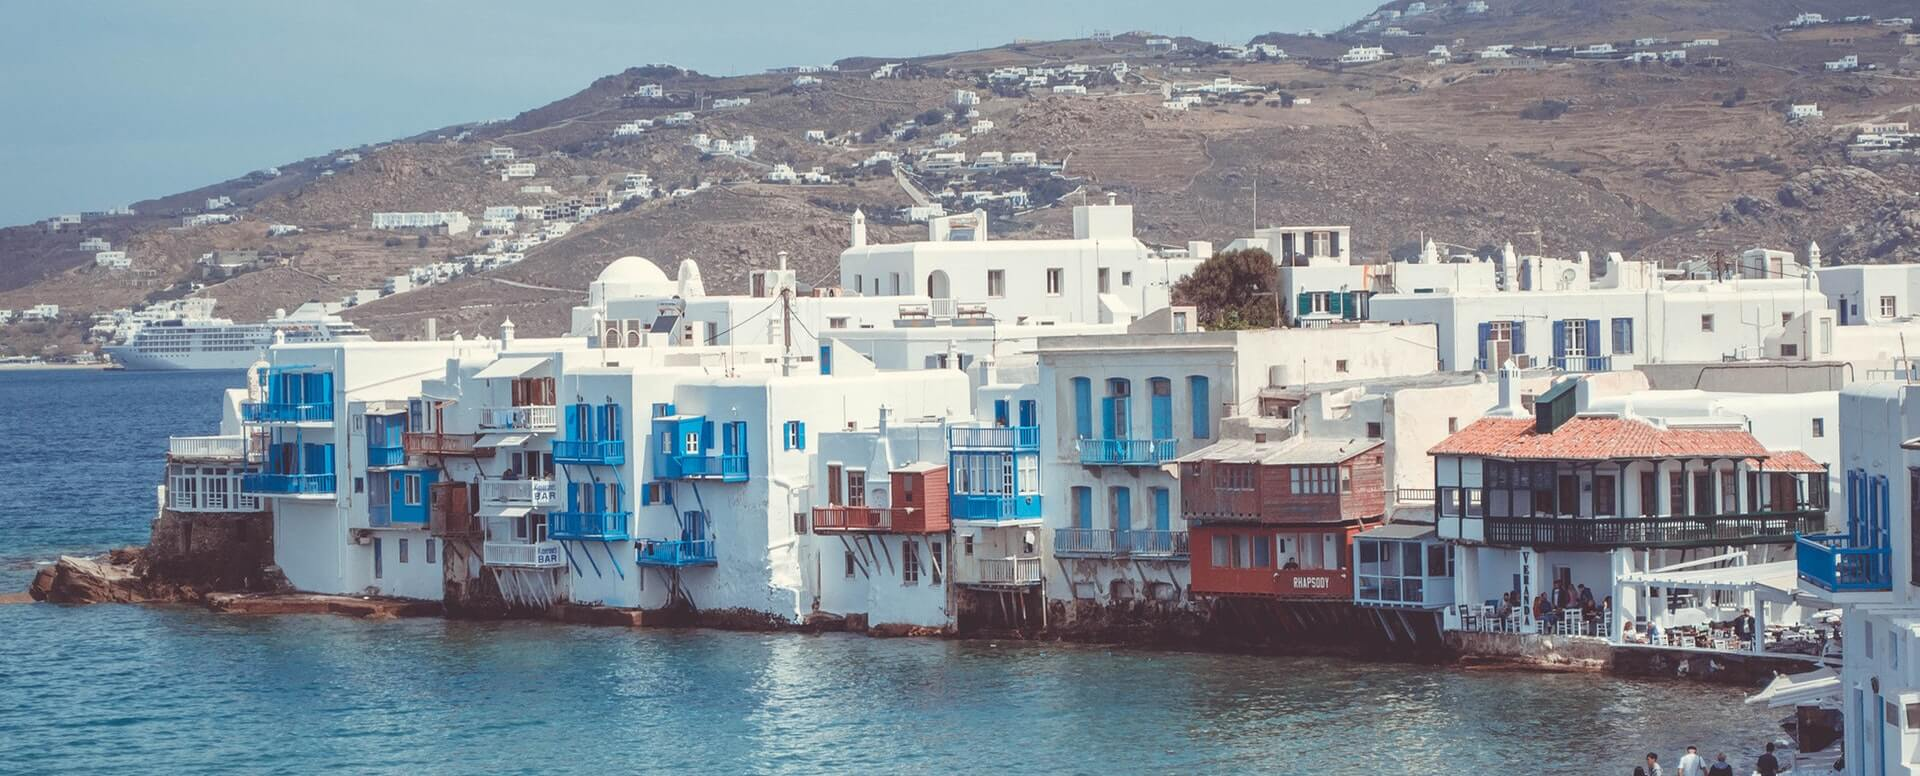 Petite Venise - Cyclades - Mykonos